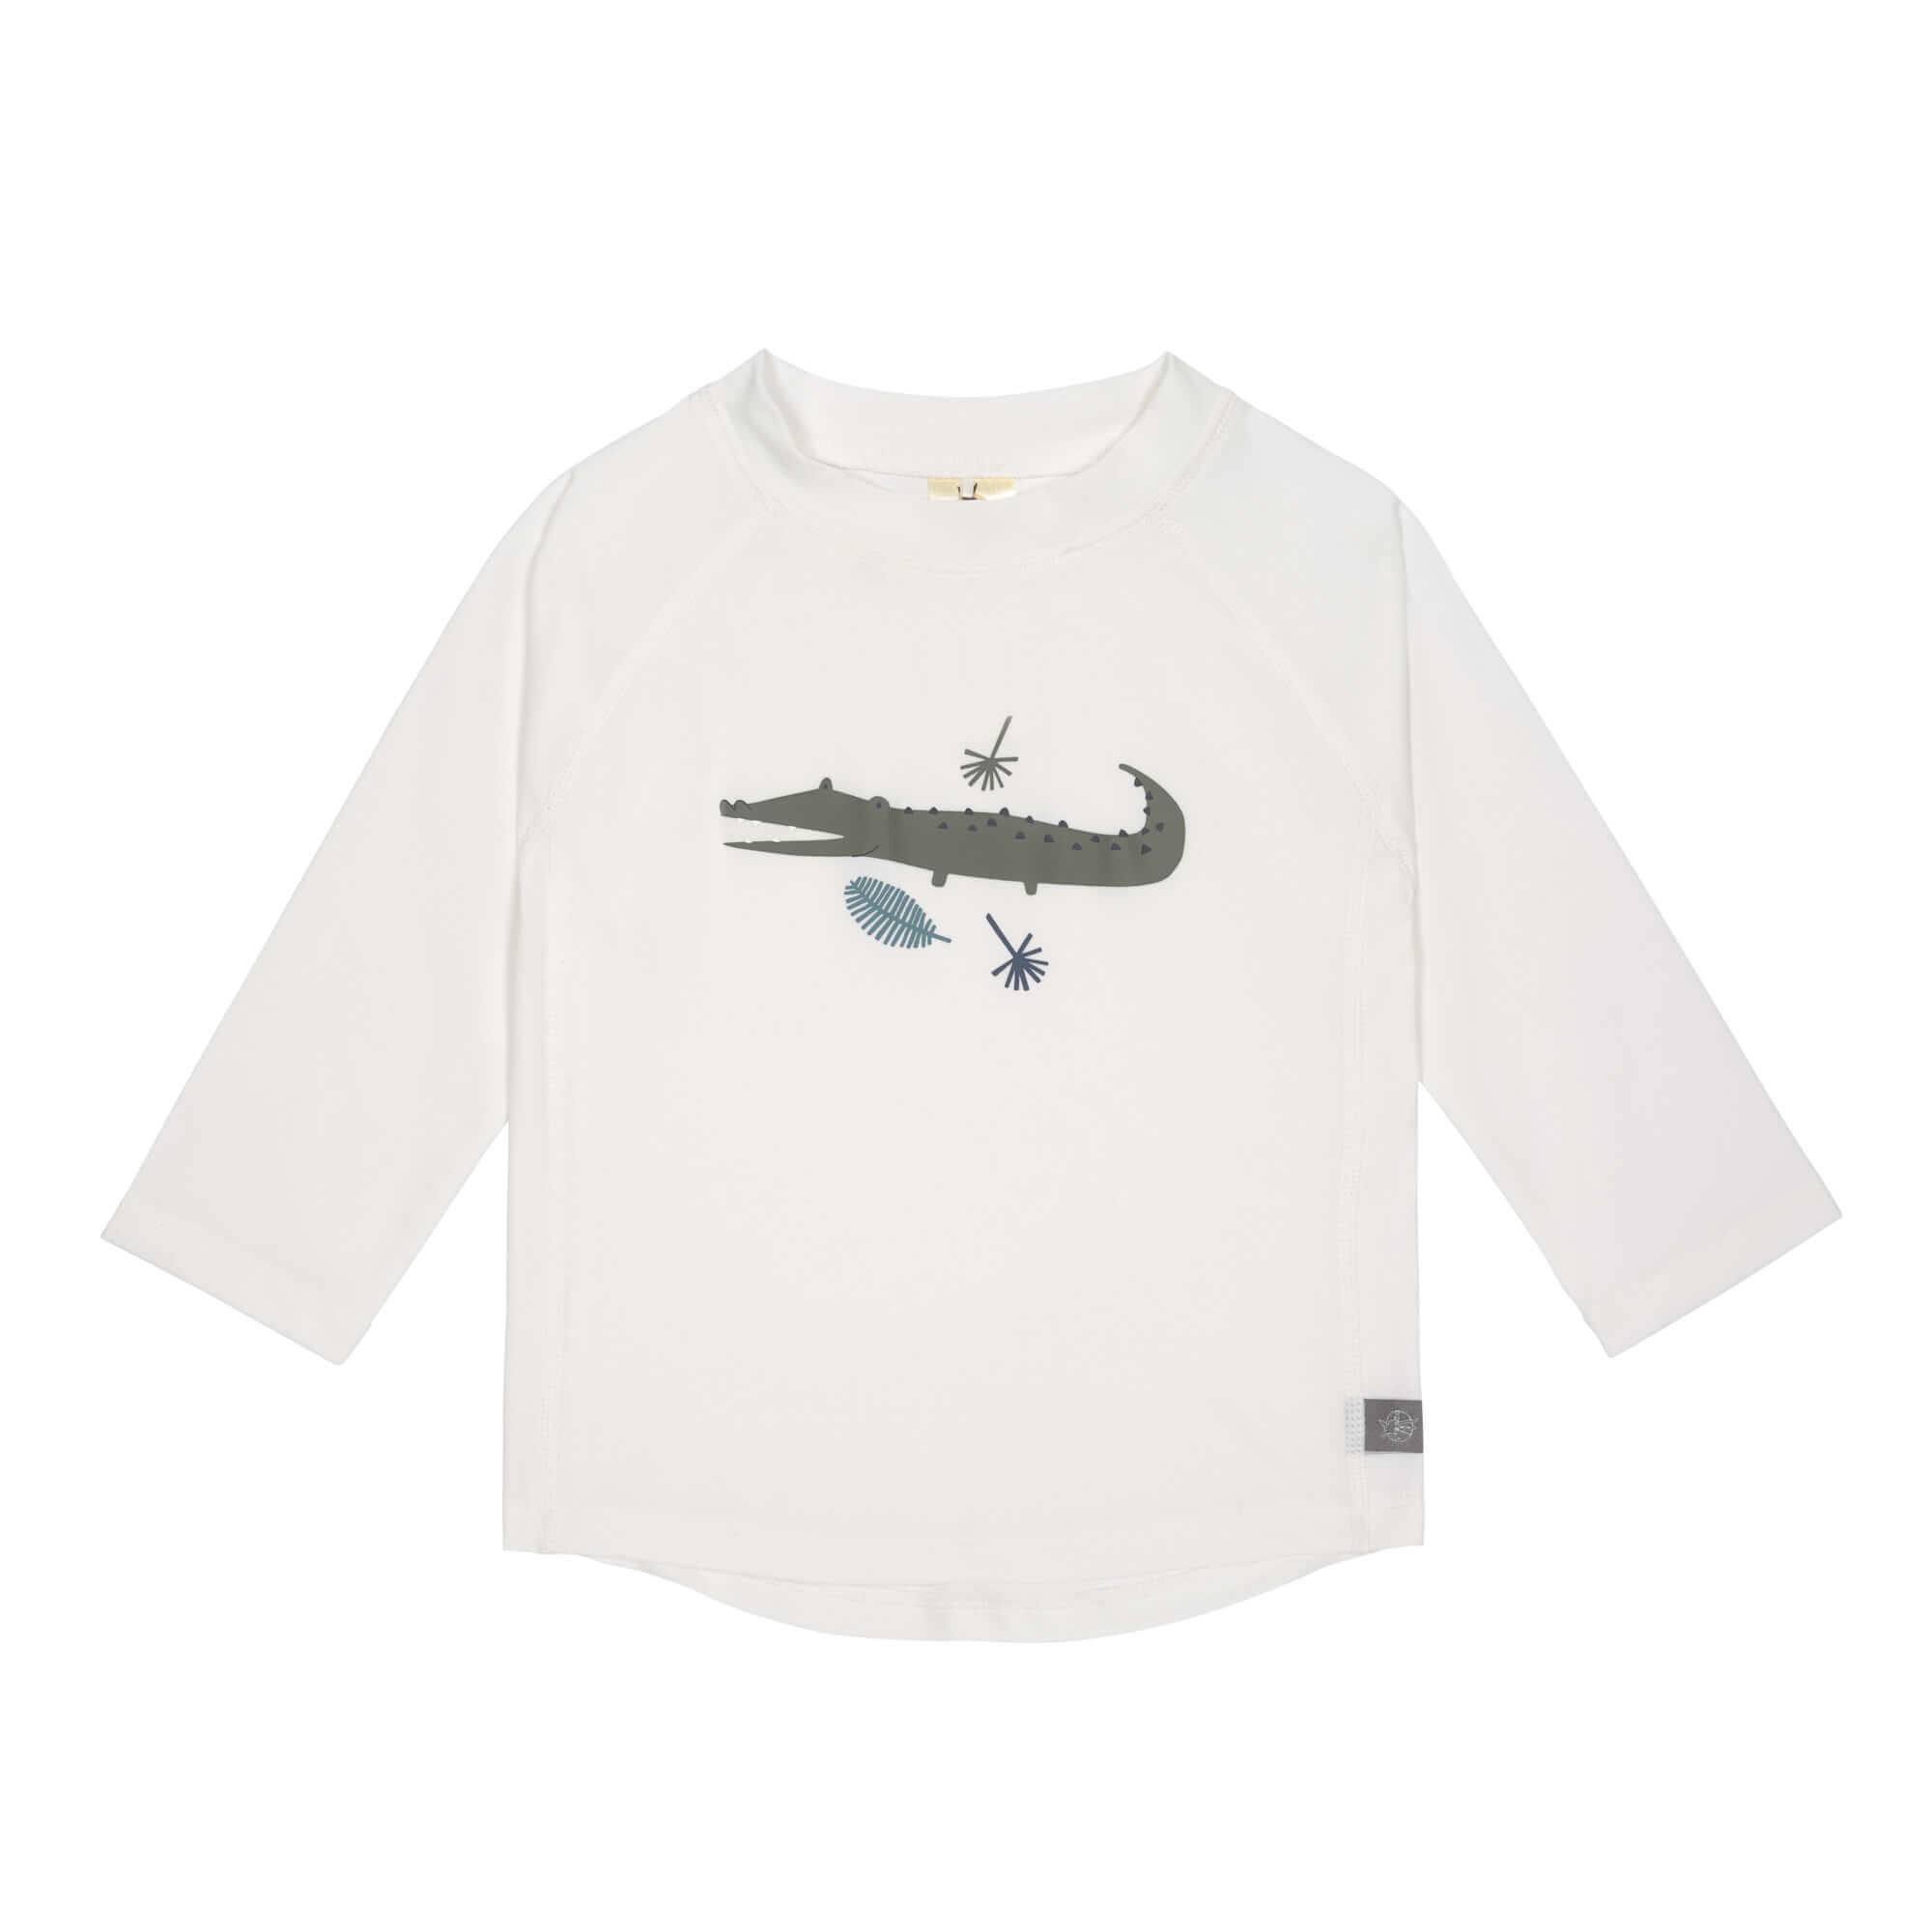 Lässig Splash & Fun Lange mouw Rashguard UV zwemshirt - Crocodile white